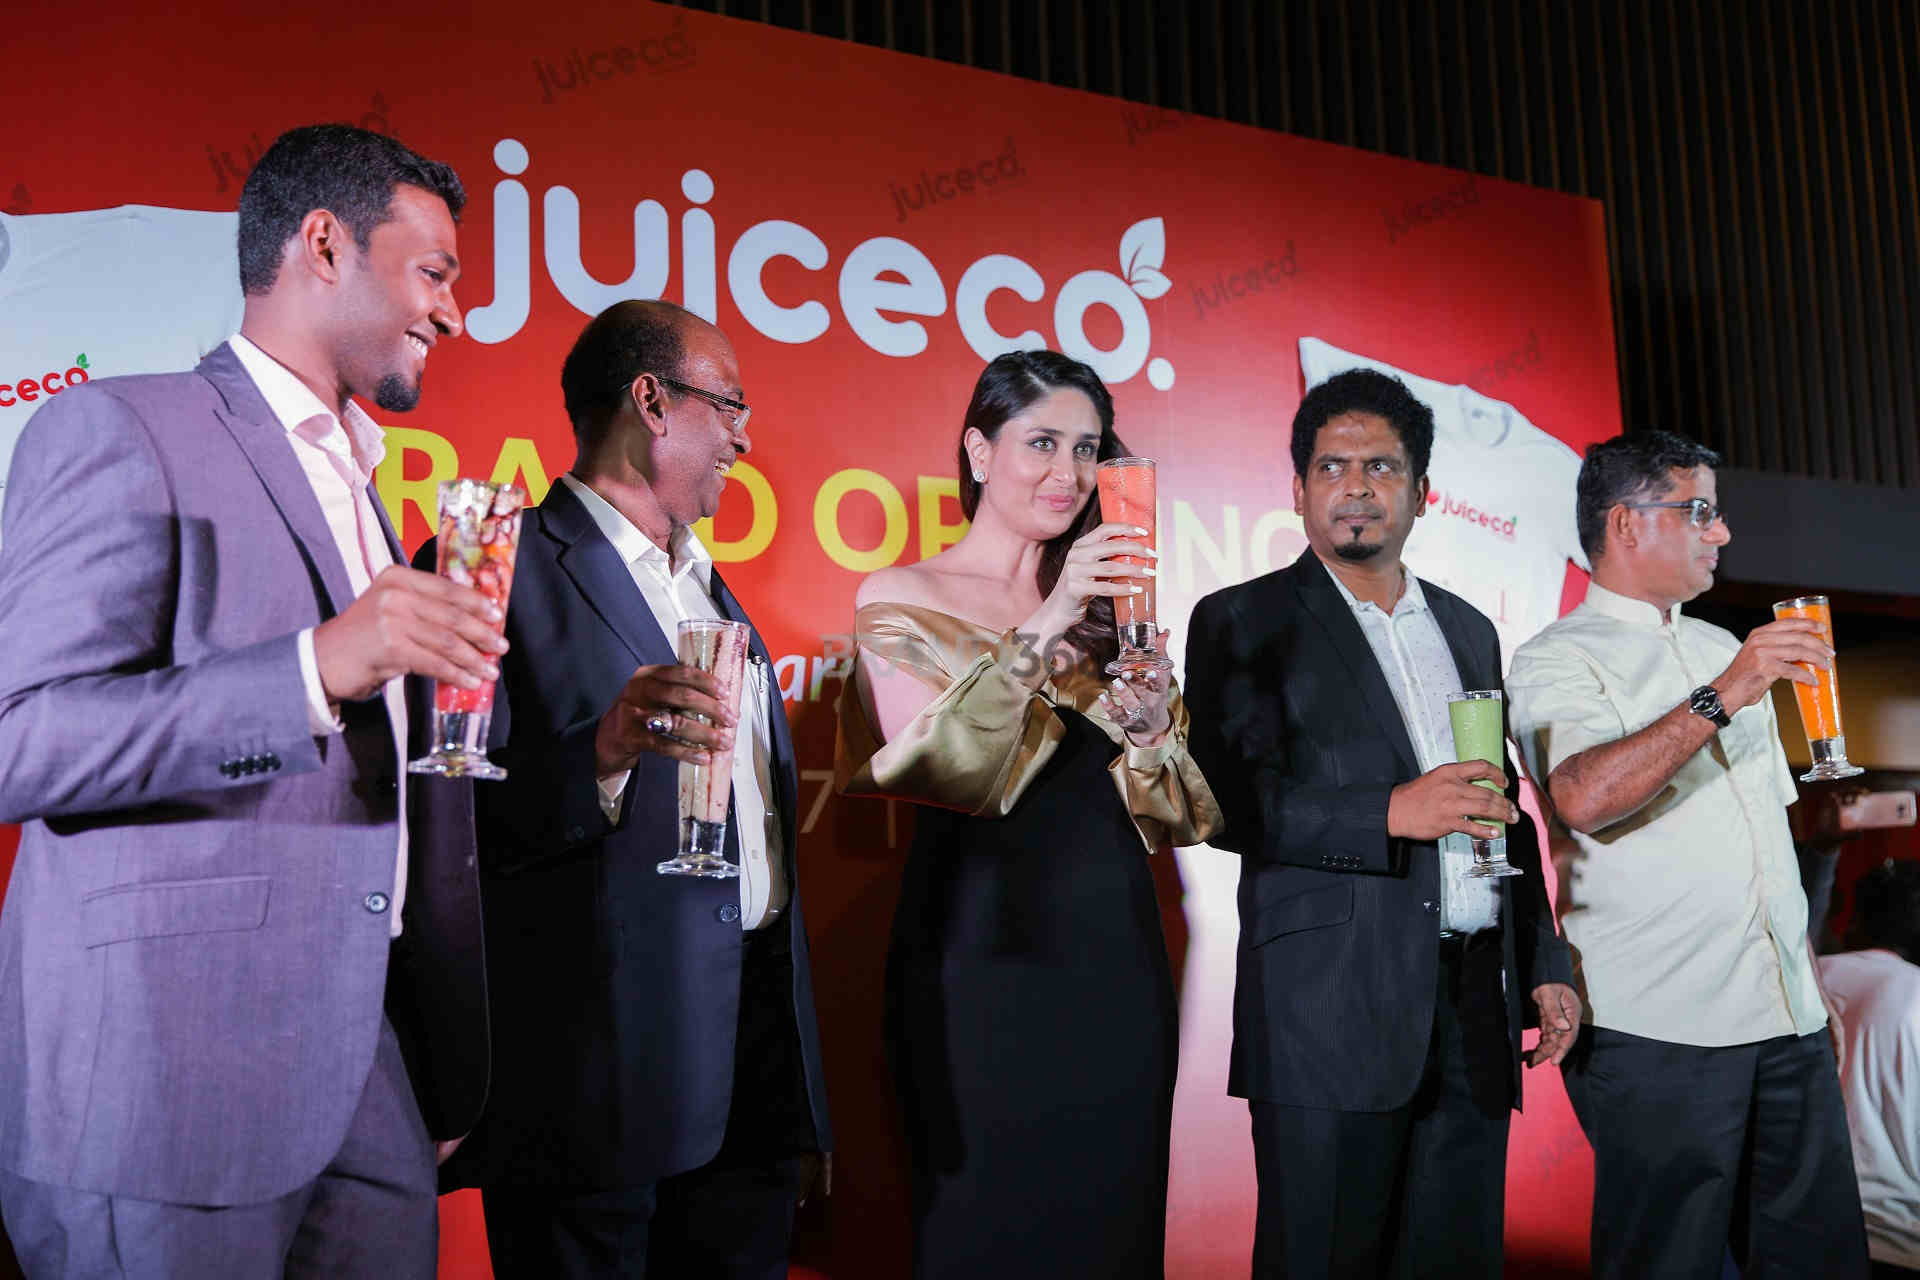 Juiceco Malaysia